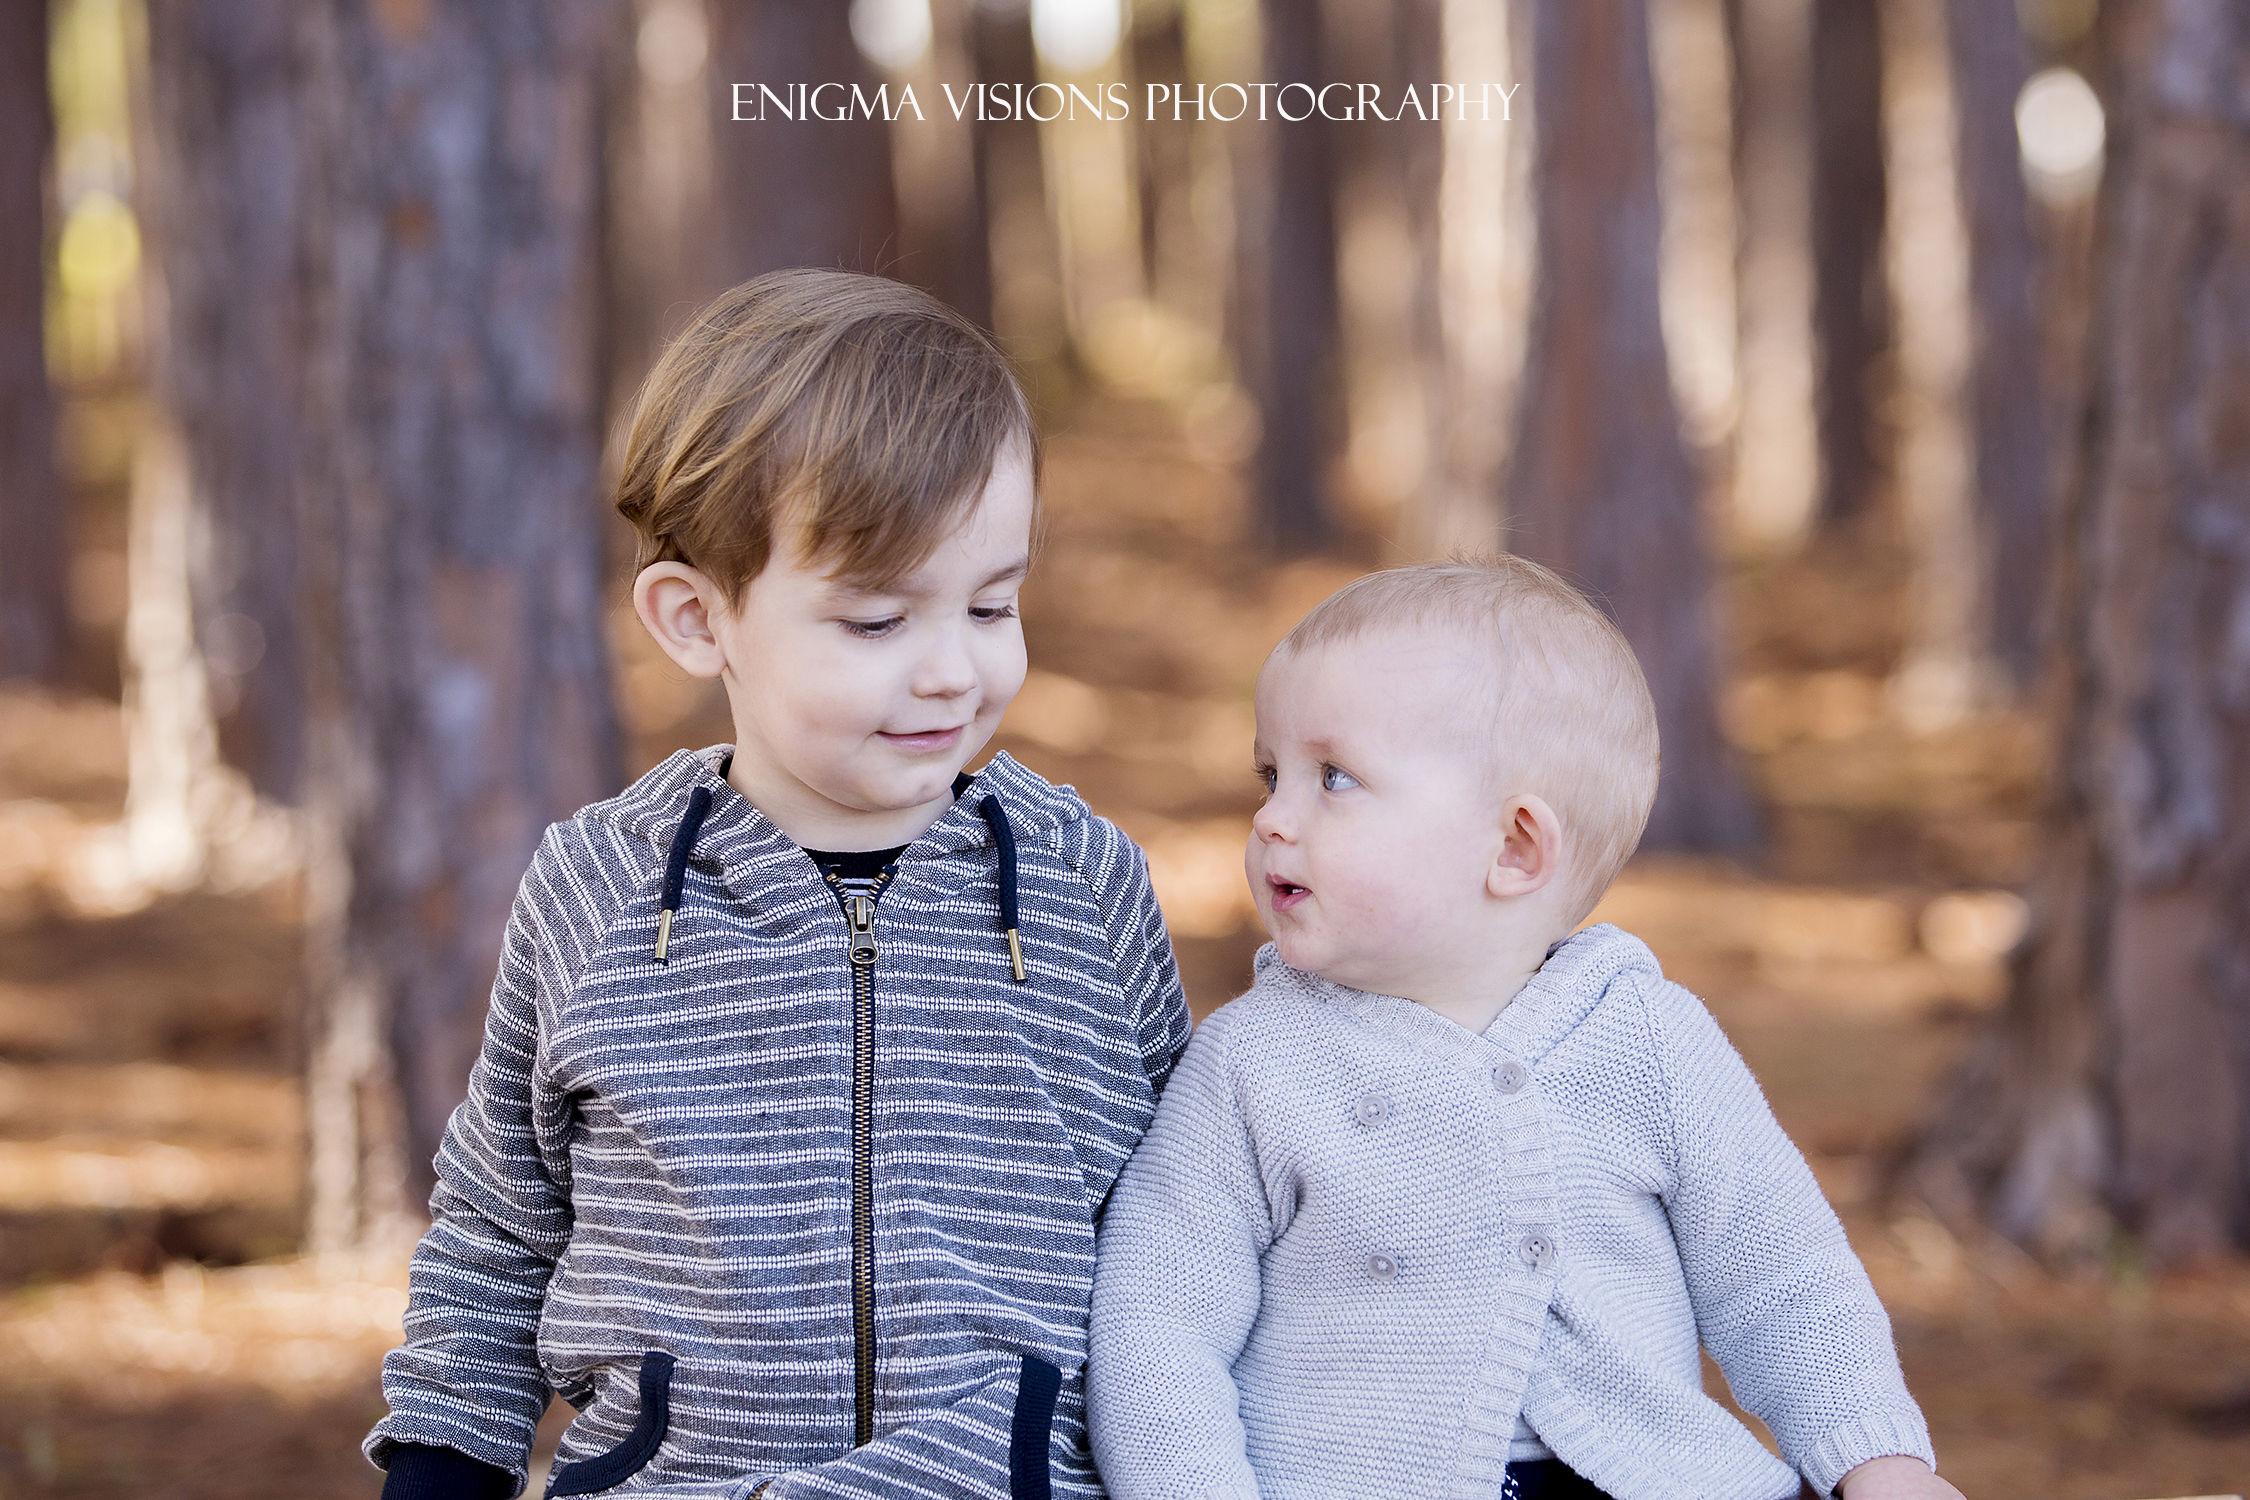 EnigmaVisionsPhotography_FAMILY_013.jpg